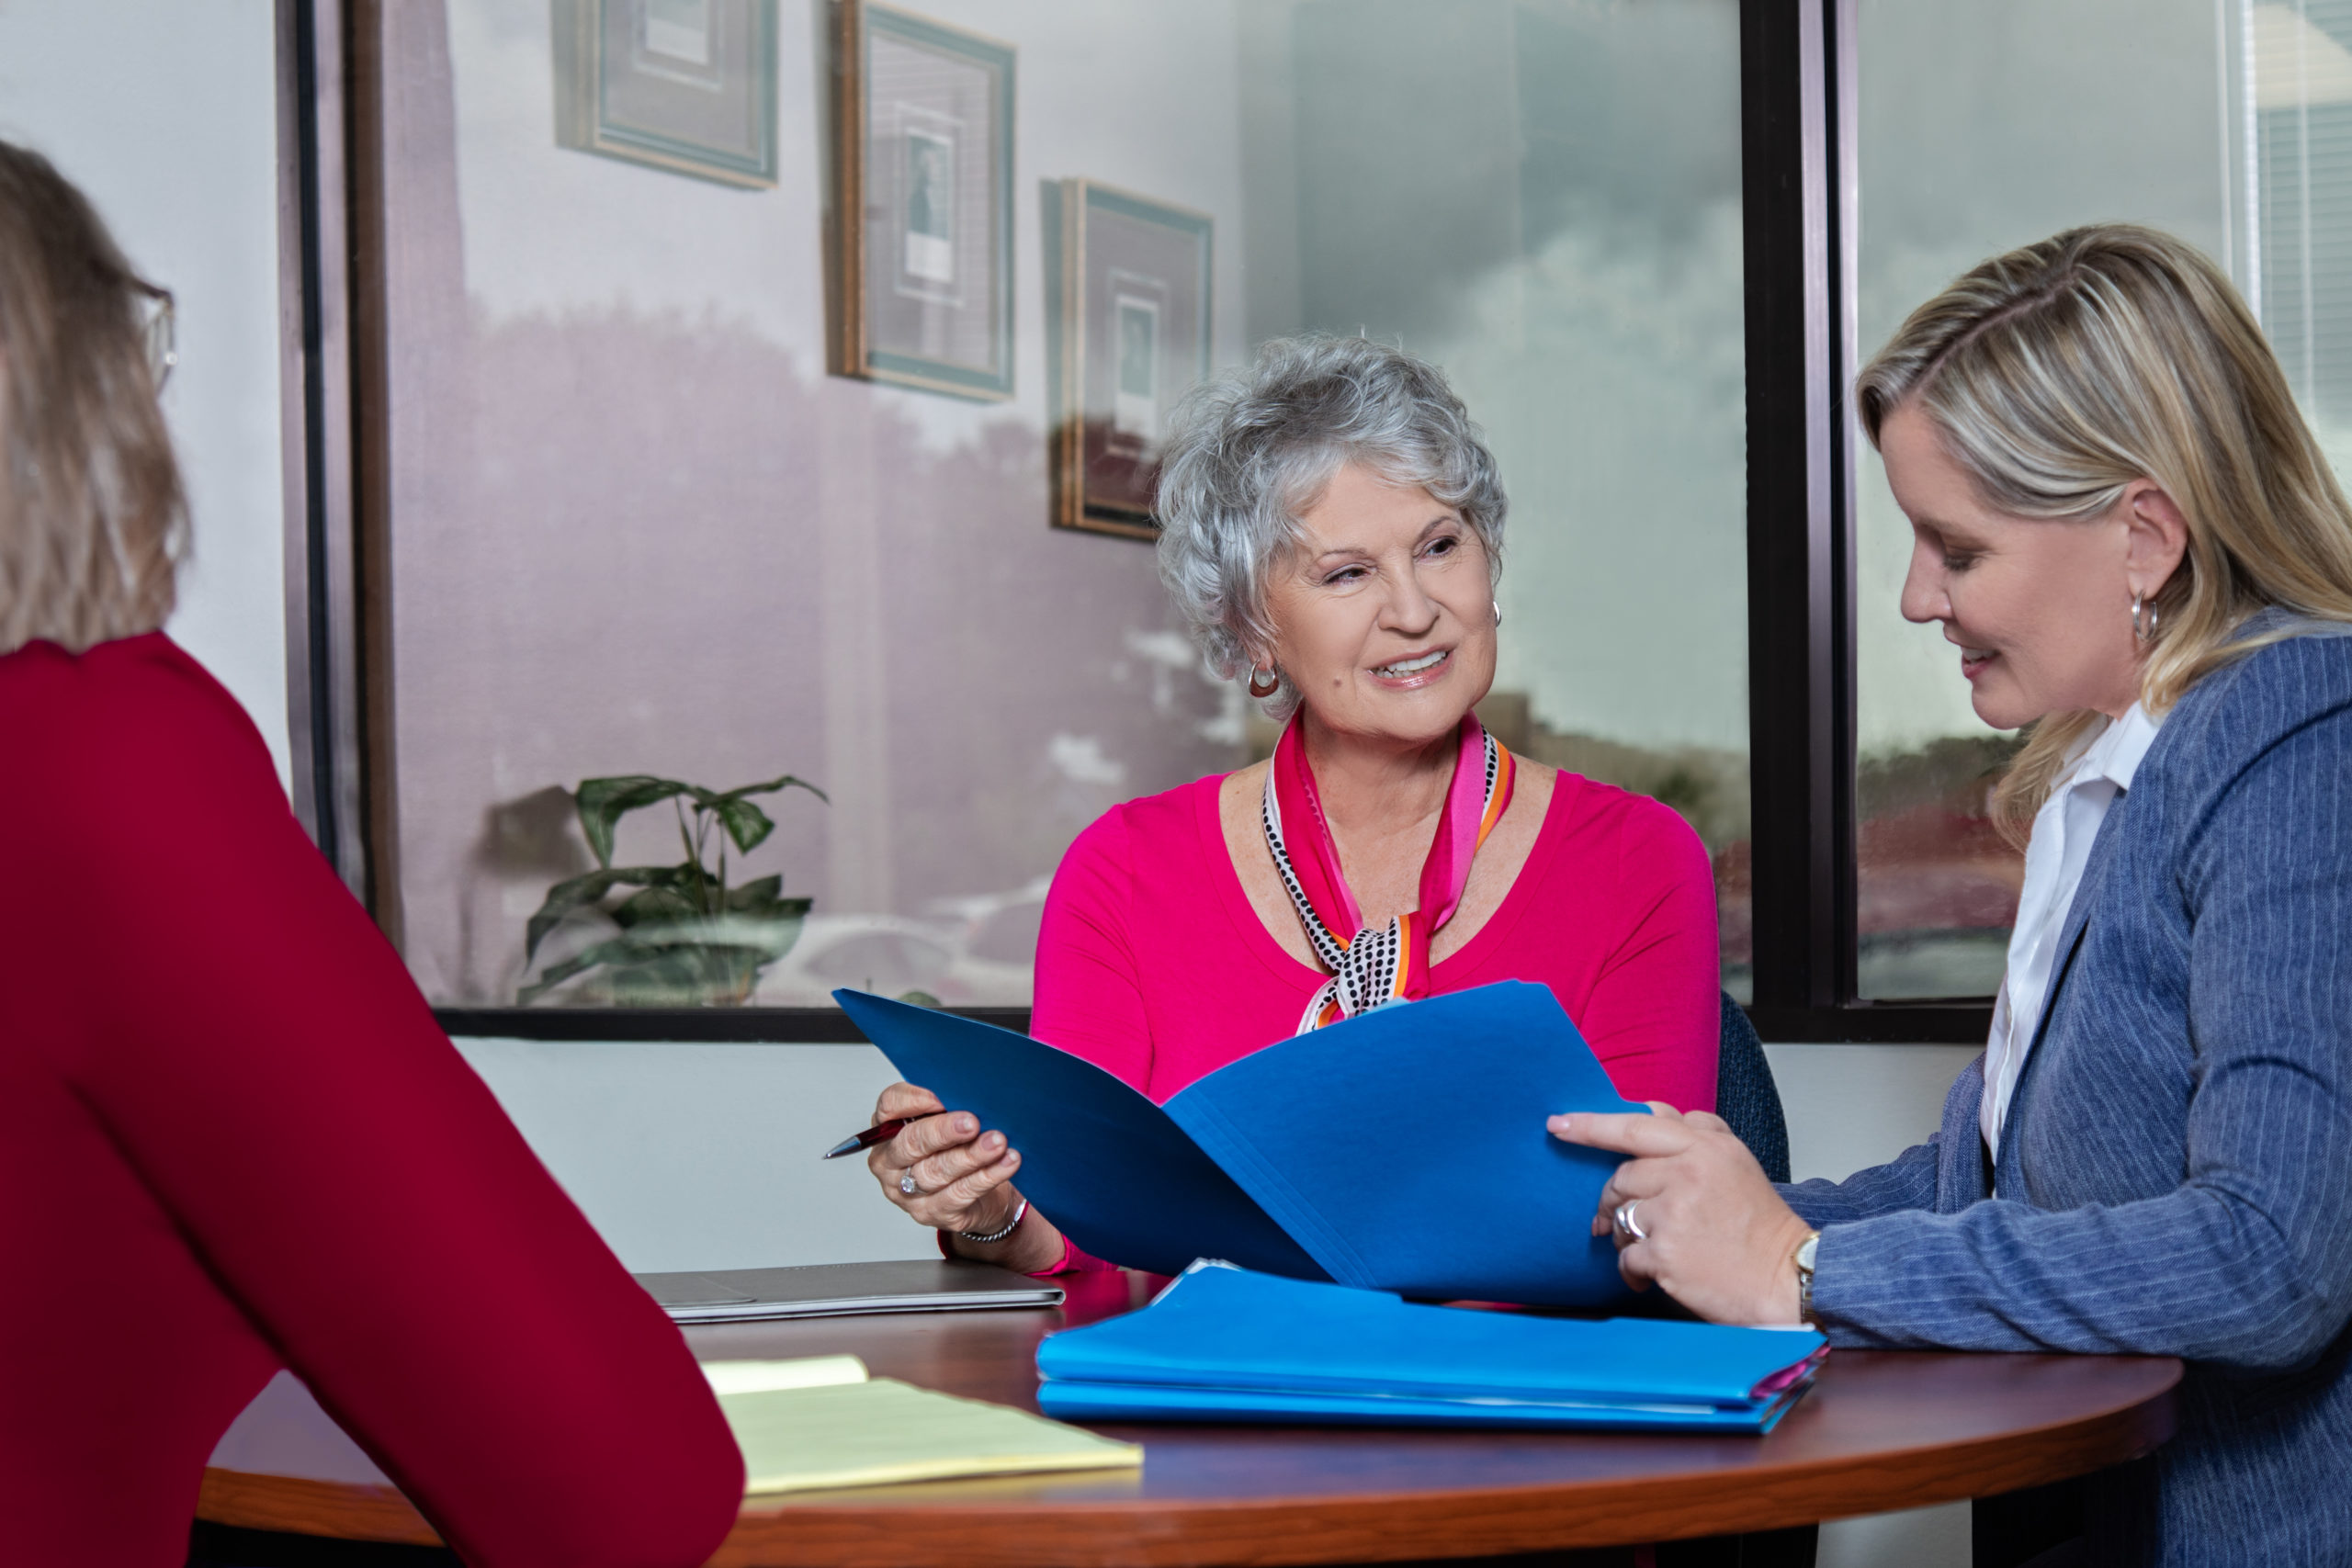 Beltz and Beltz Nursing Home Abuse Second Opinion